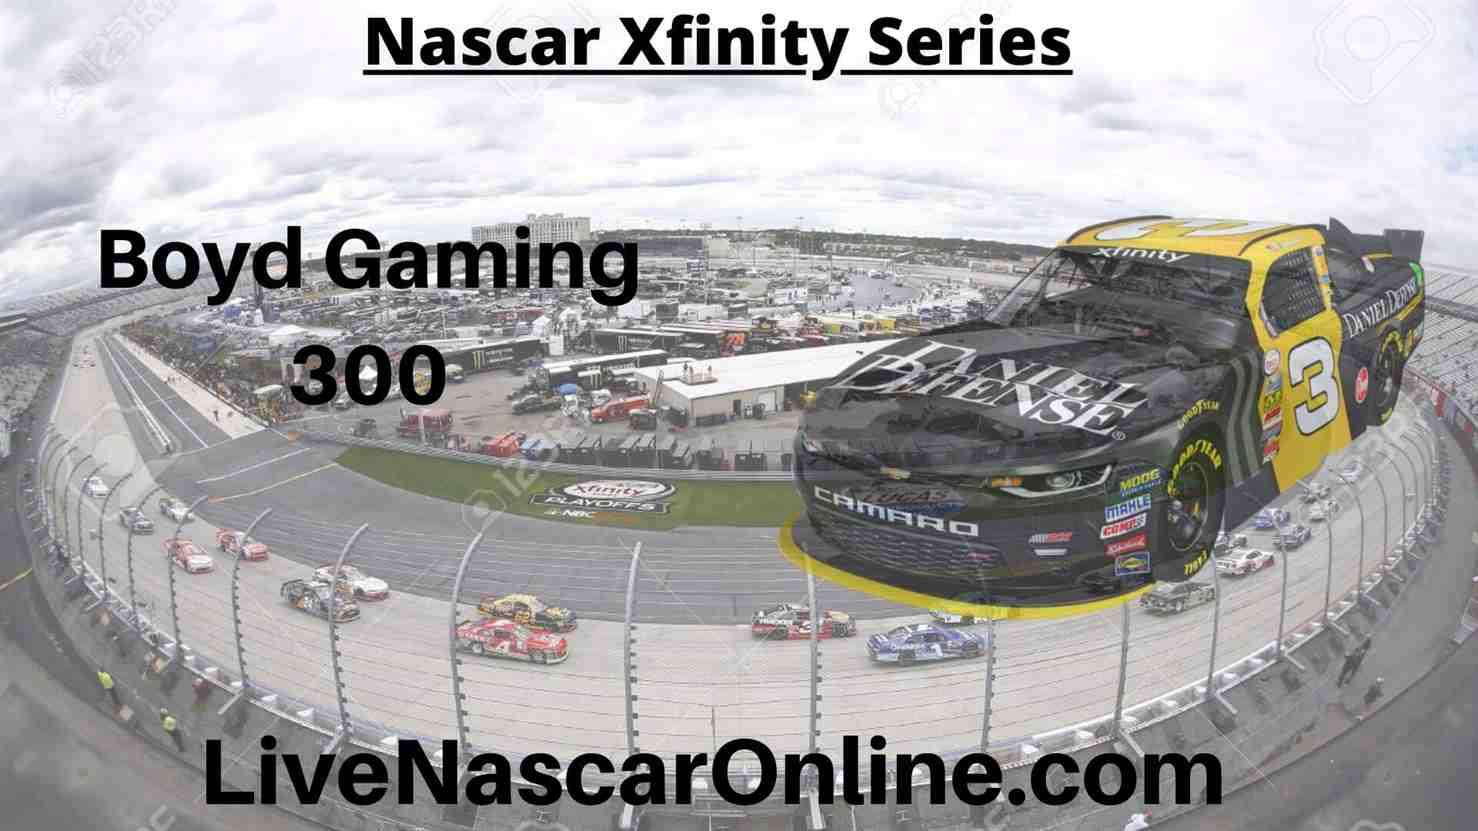 Boyd Gaming 300 Online Stream | NASCAR Las Vegas 2020